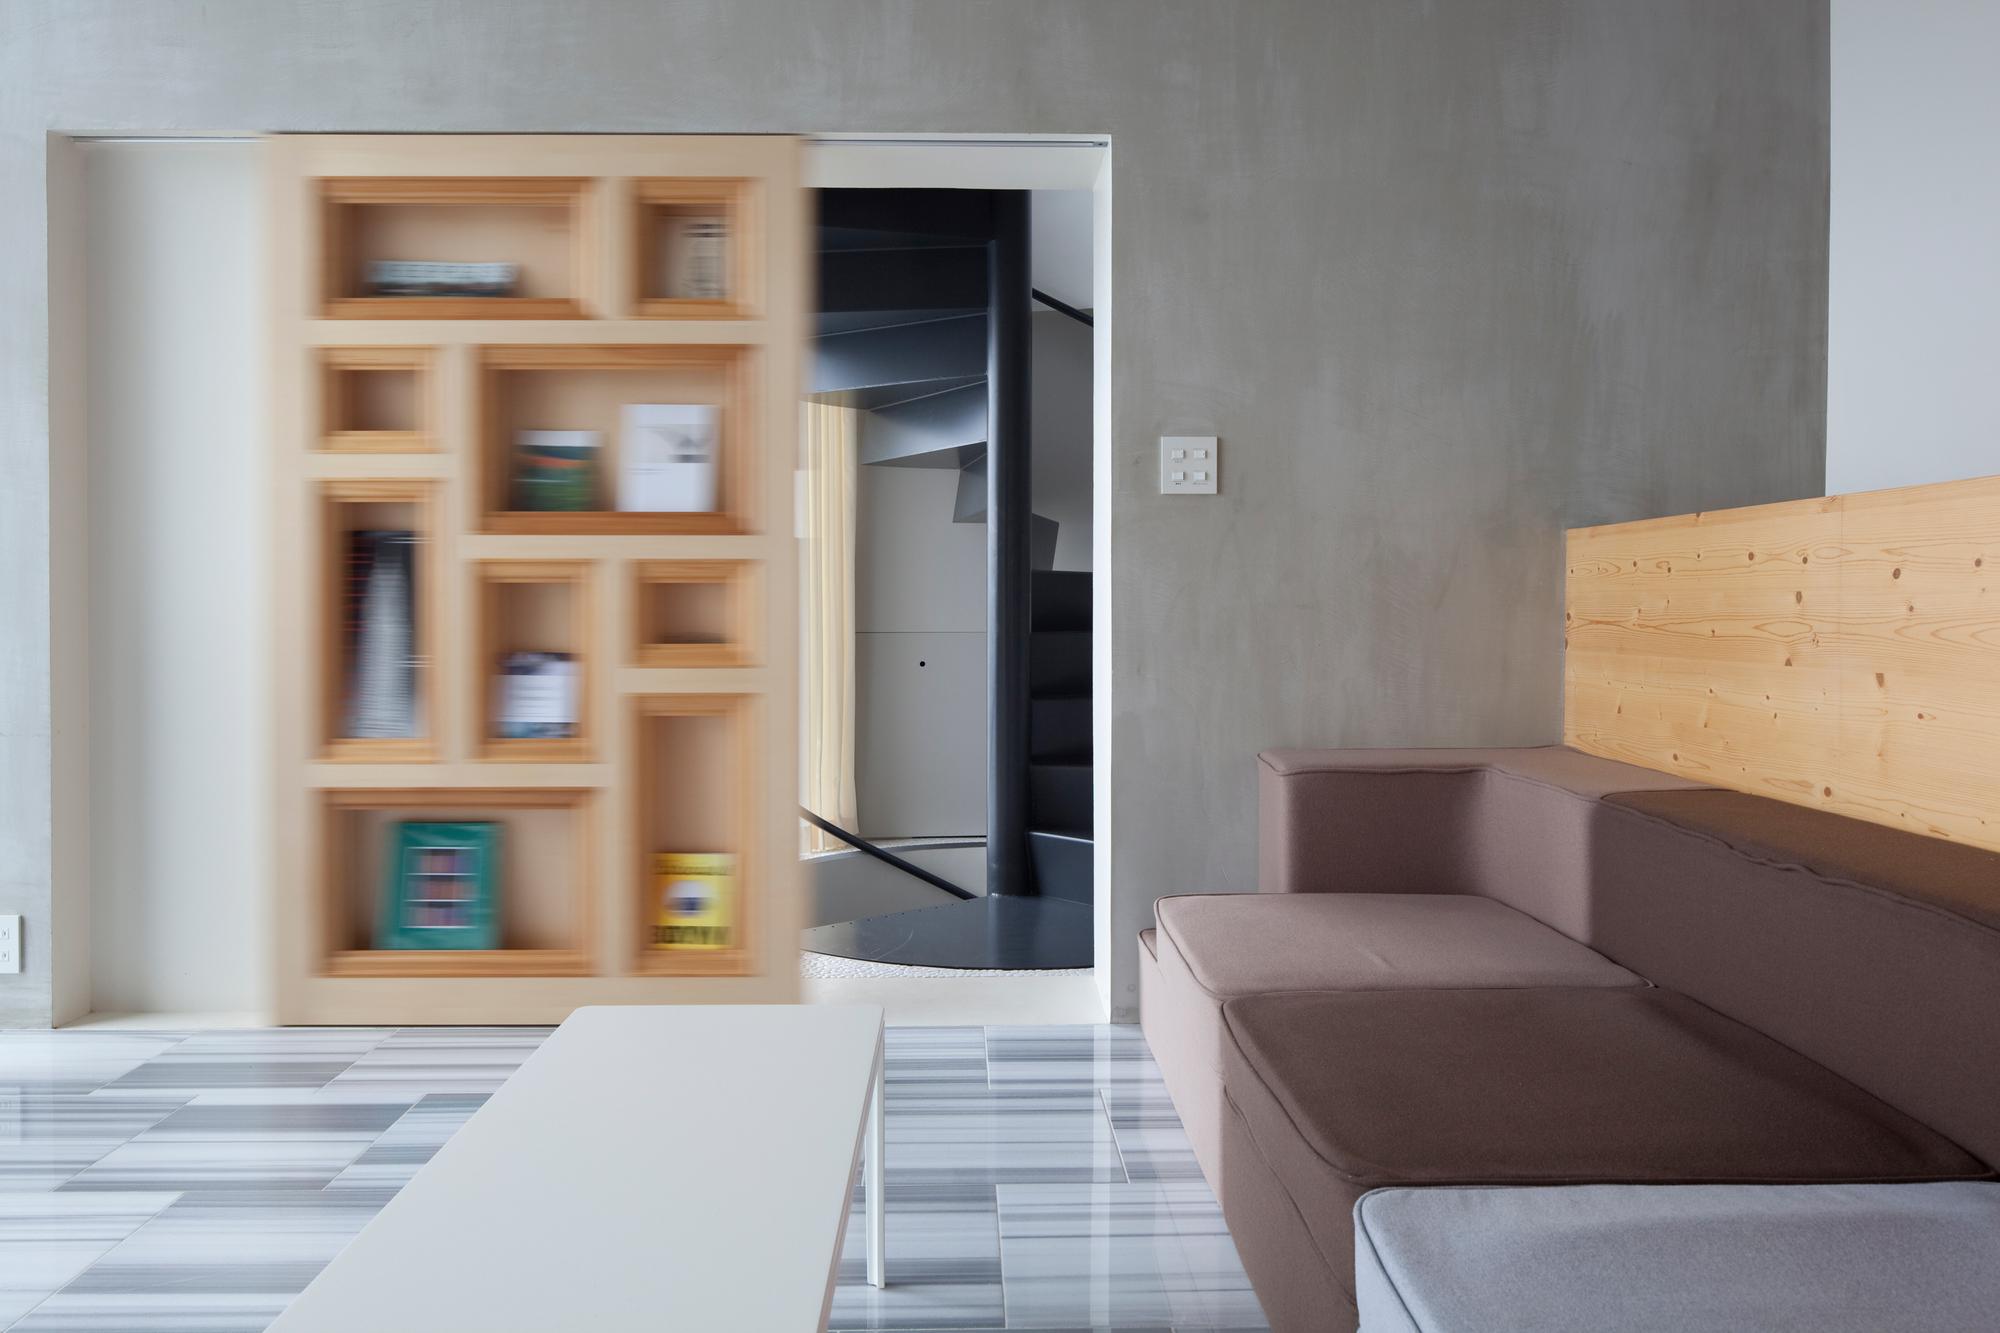 518b9b22b3fc4b7a33000081_nowhere-but-sajima-yasutaka-yoshimura-architects__mg_5494.jpg